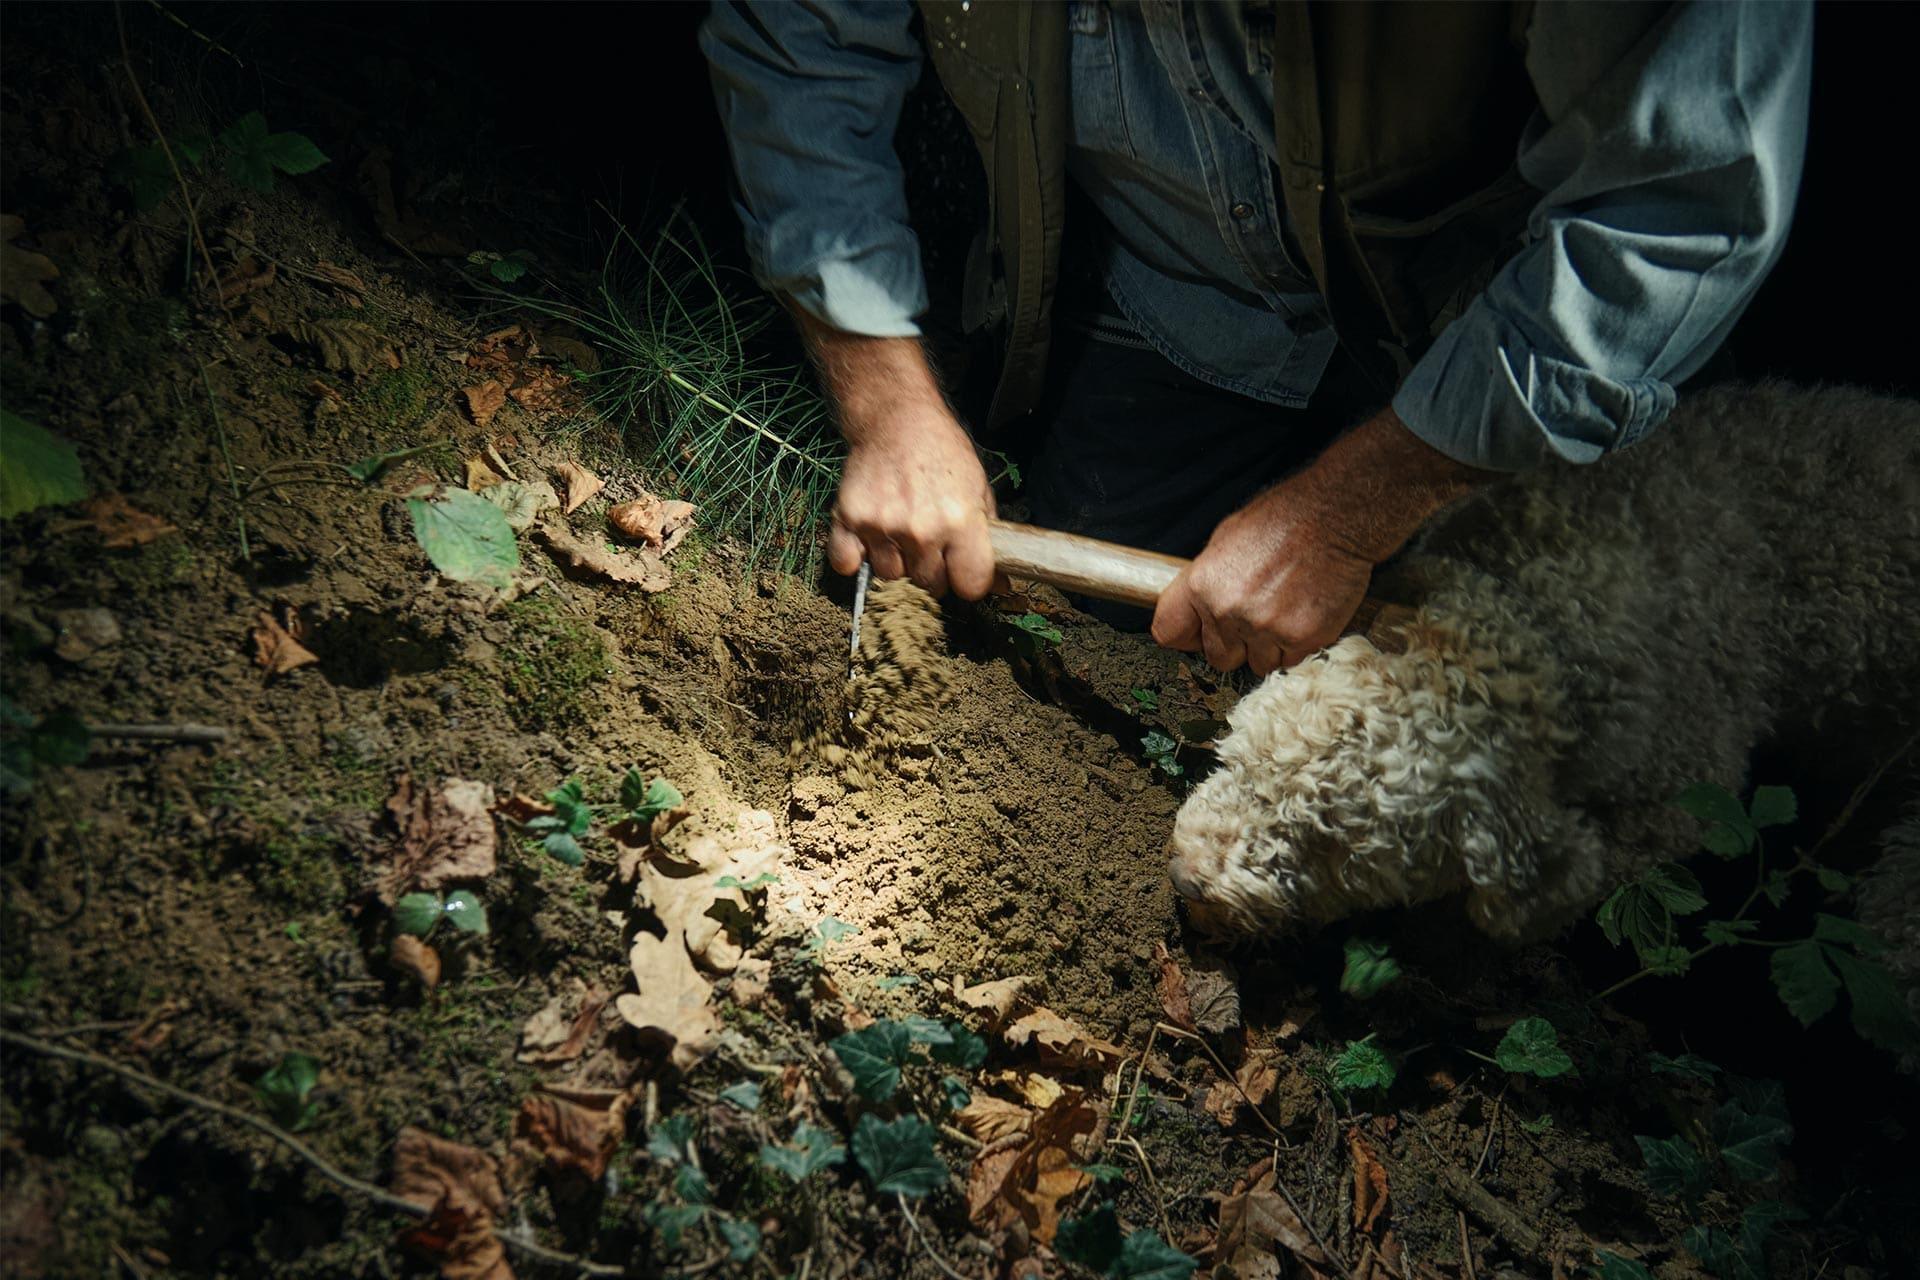 Truffle hunter digging in the soil